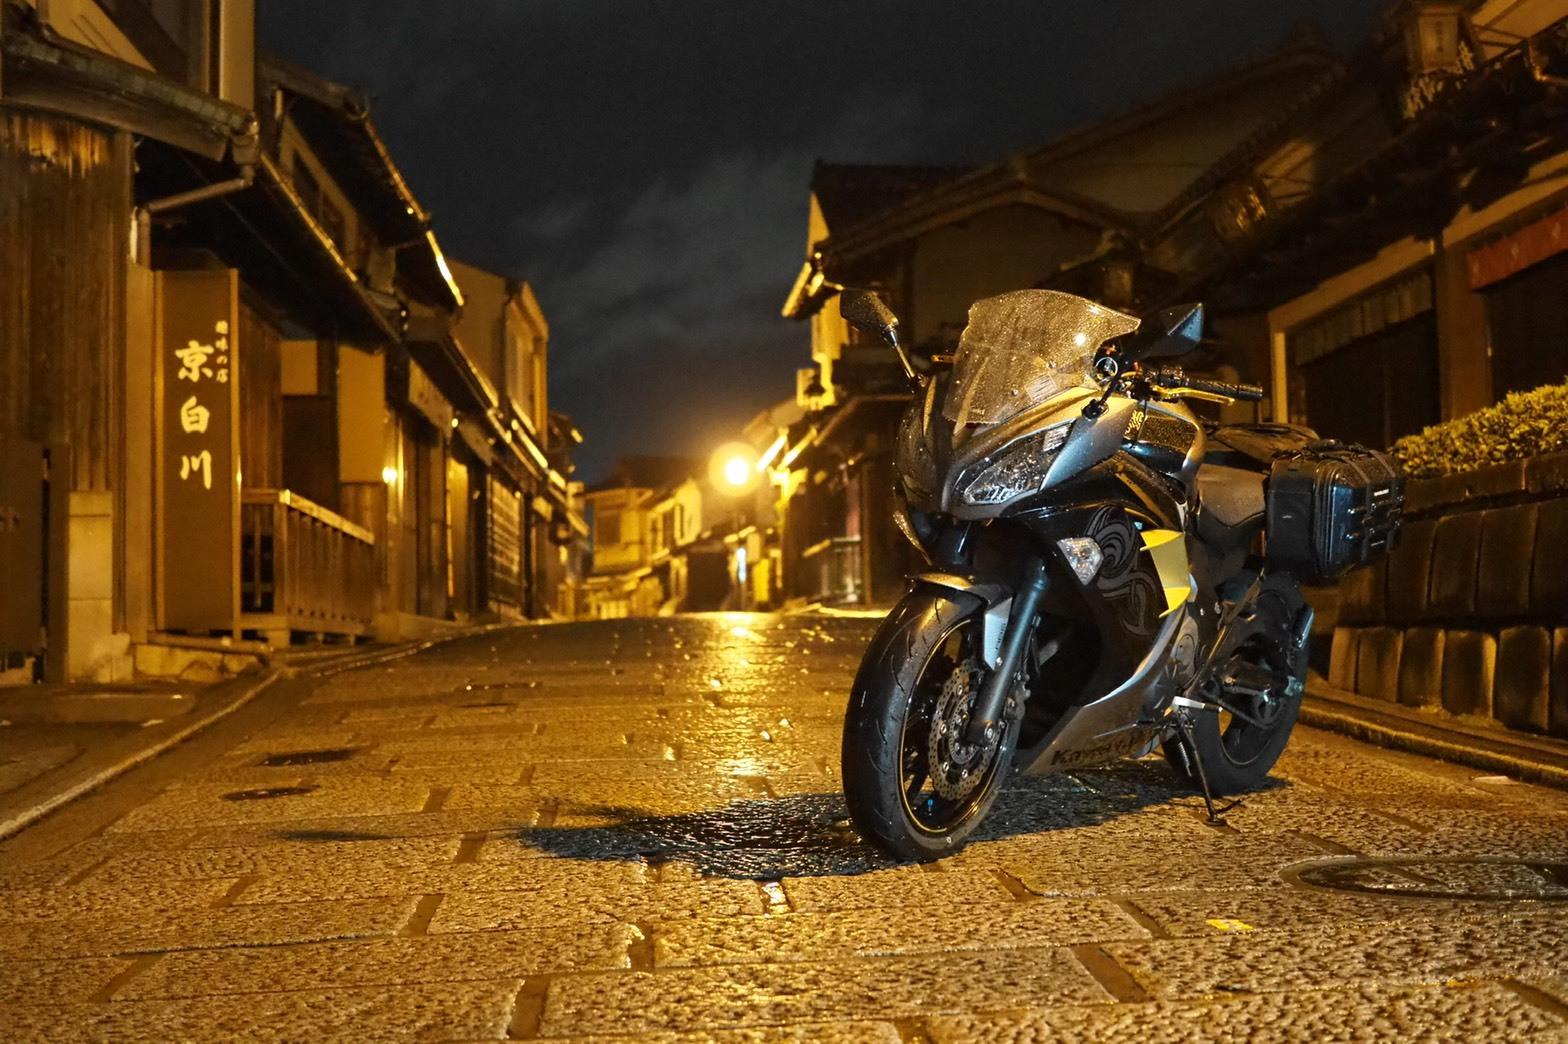 motorcycle-blog-kyoto-nighttouring-nightview-sannenzaka-sanneizaka-ninja-kawasaki.jpg